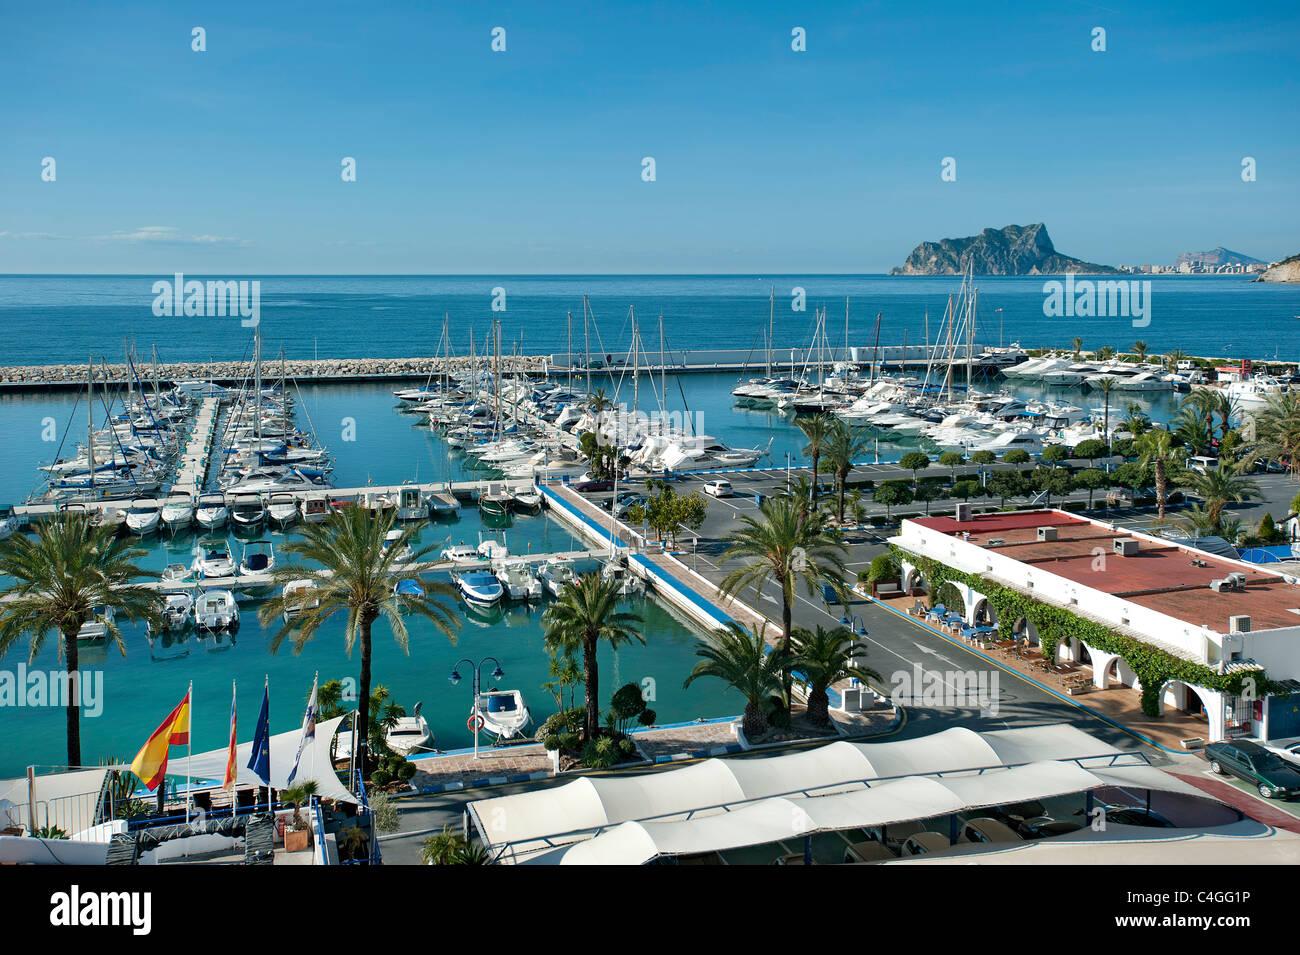 Overview of Harbour, Moraira, Costa Blanca, Spain - Stock Image